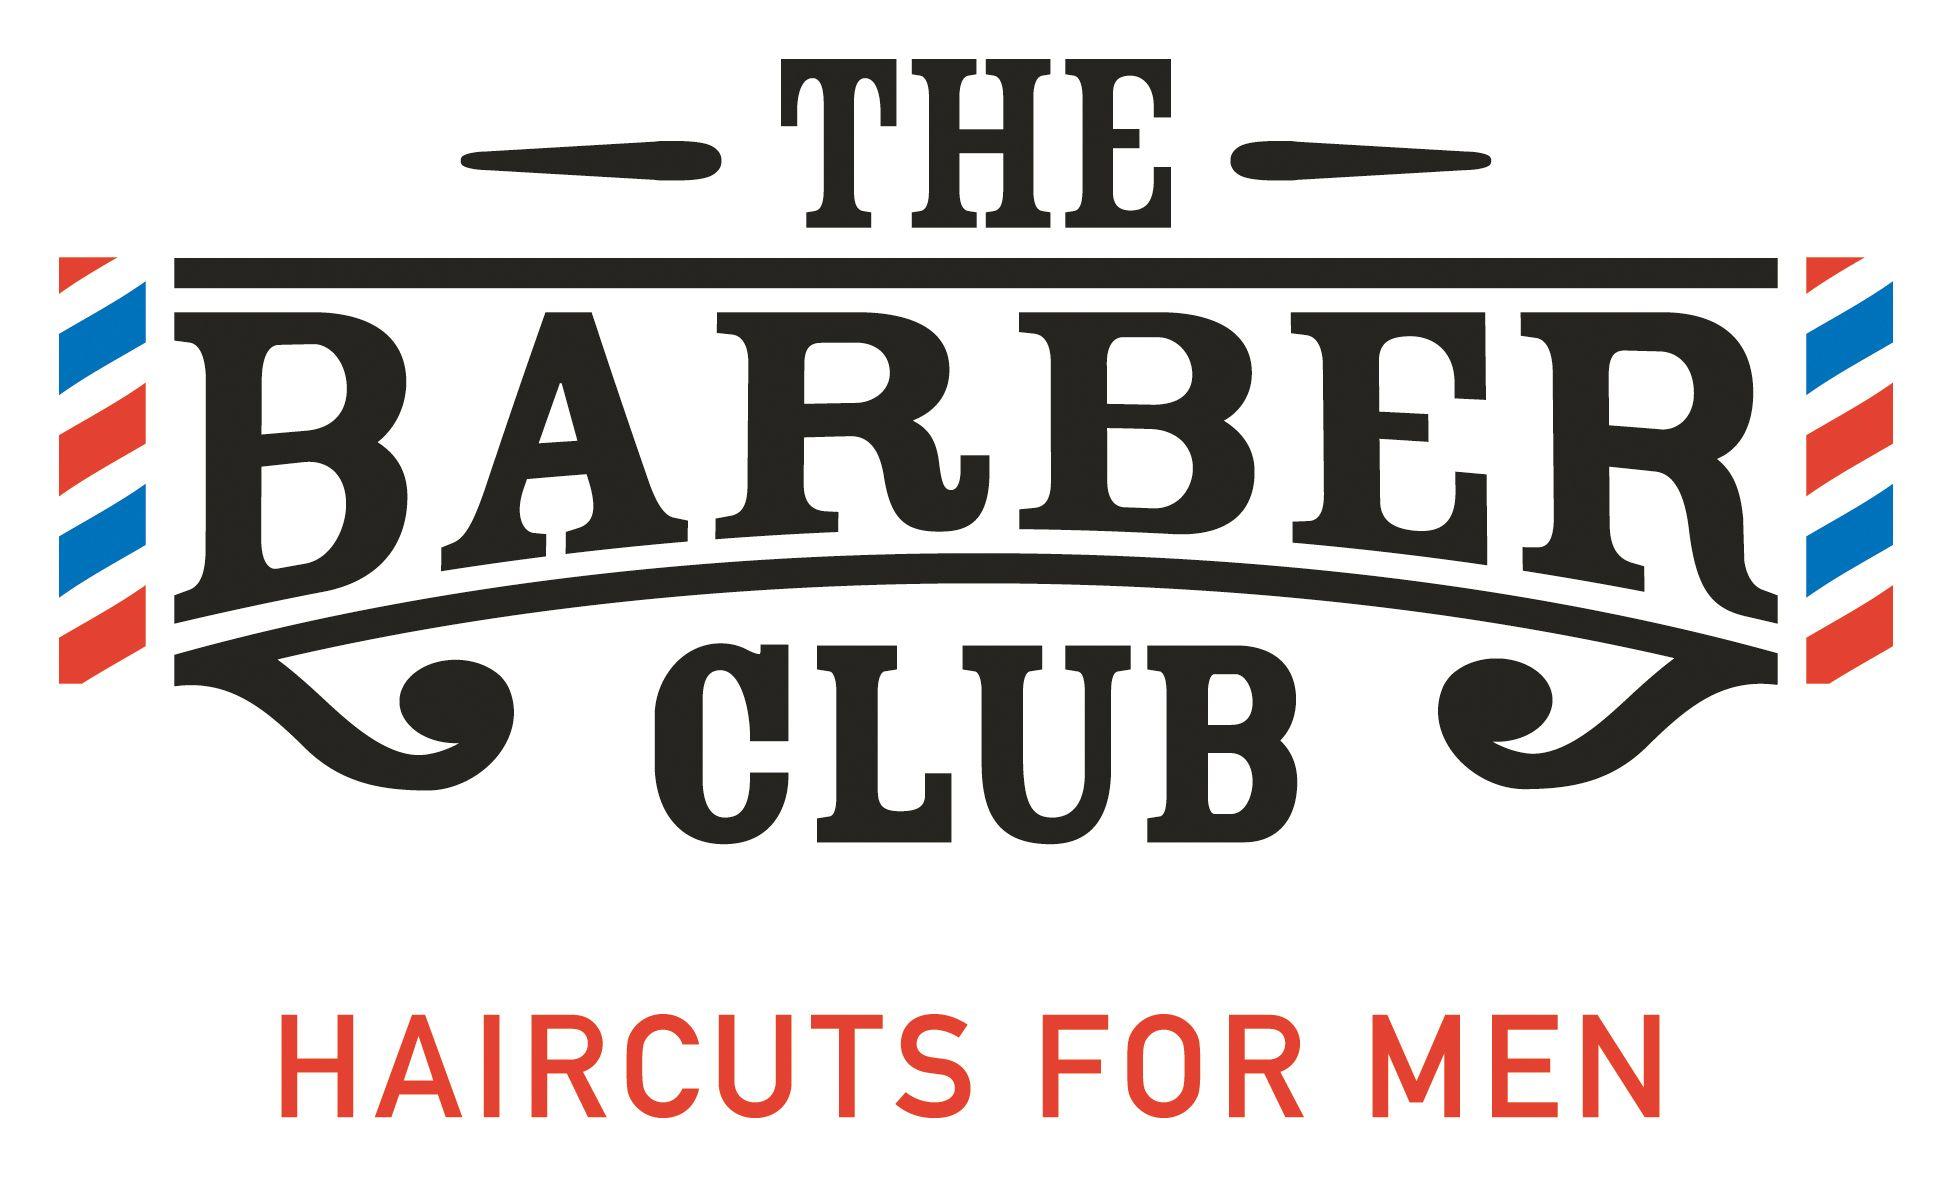 barber shop pole vector - Поиск в Google | typography ...